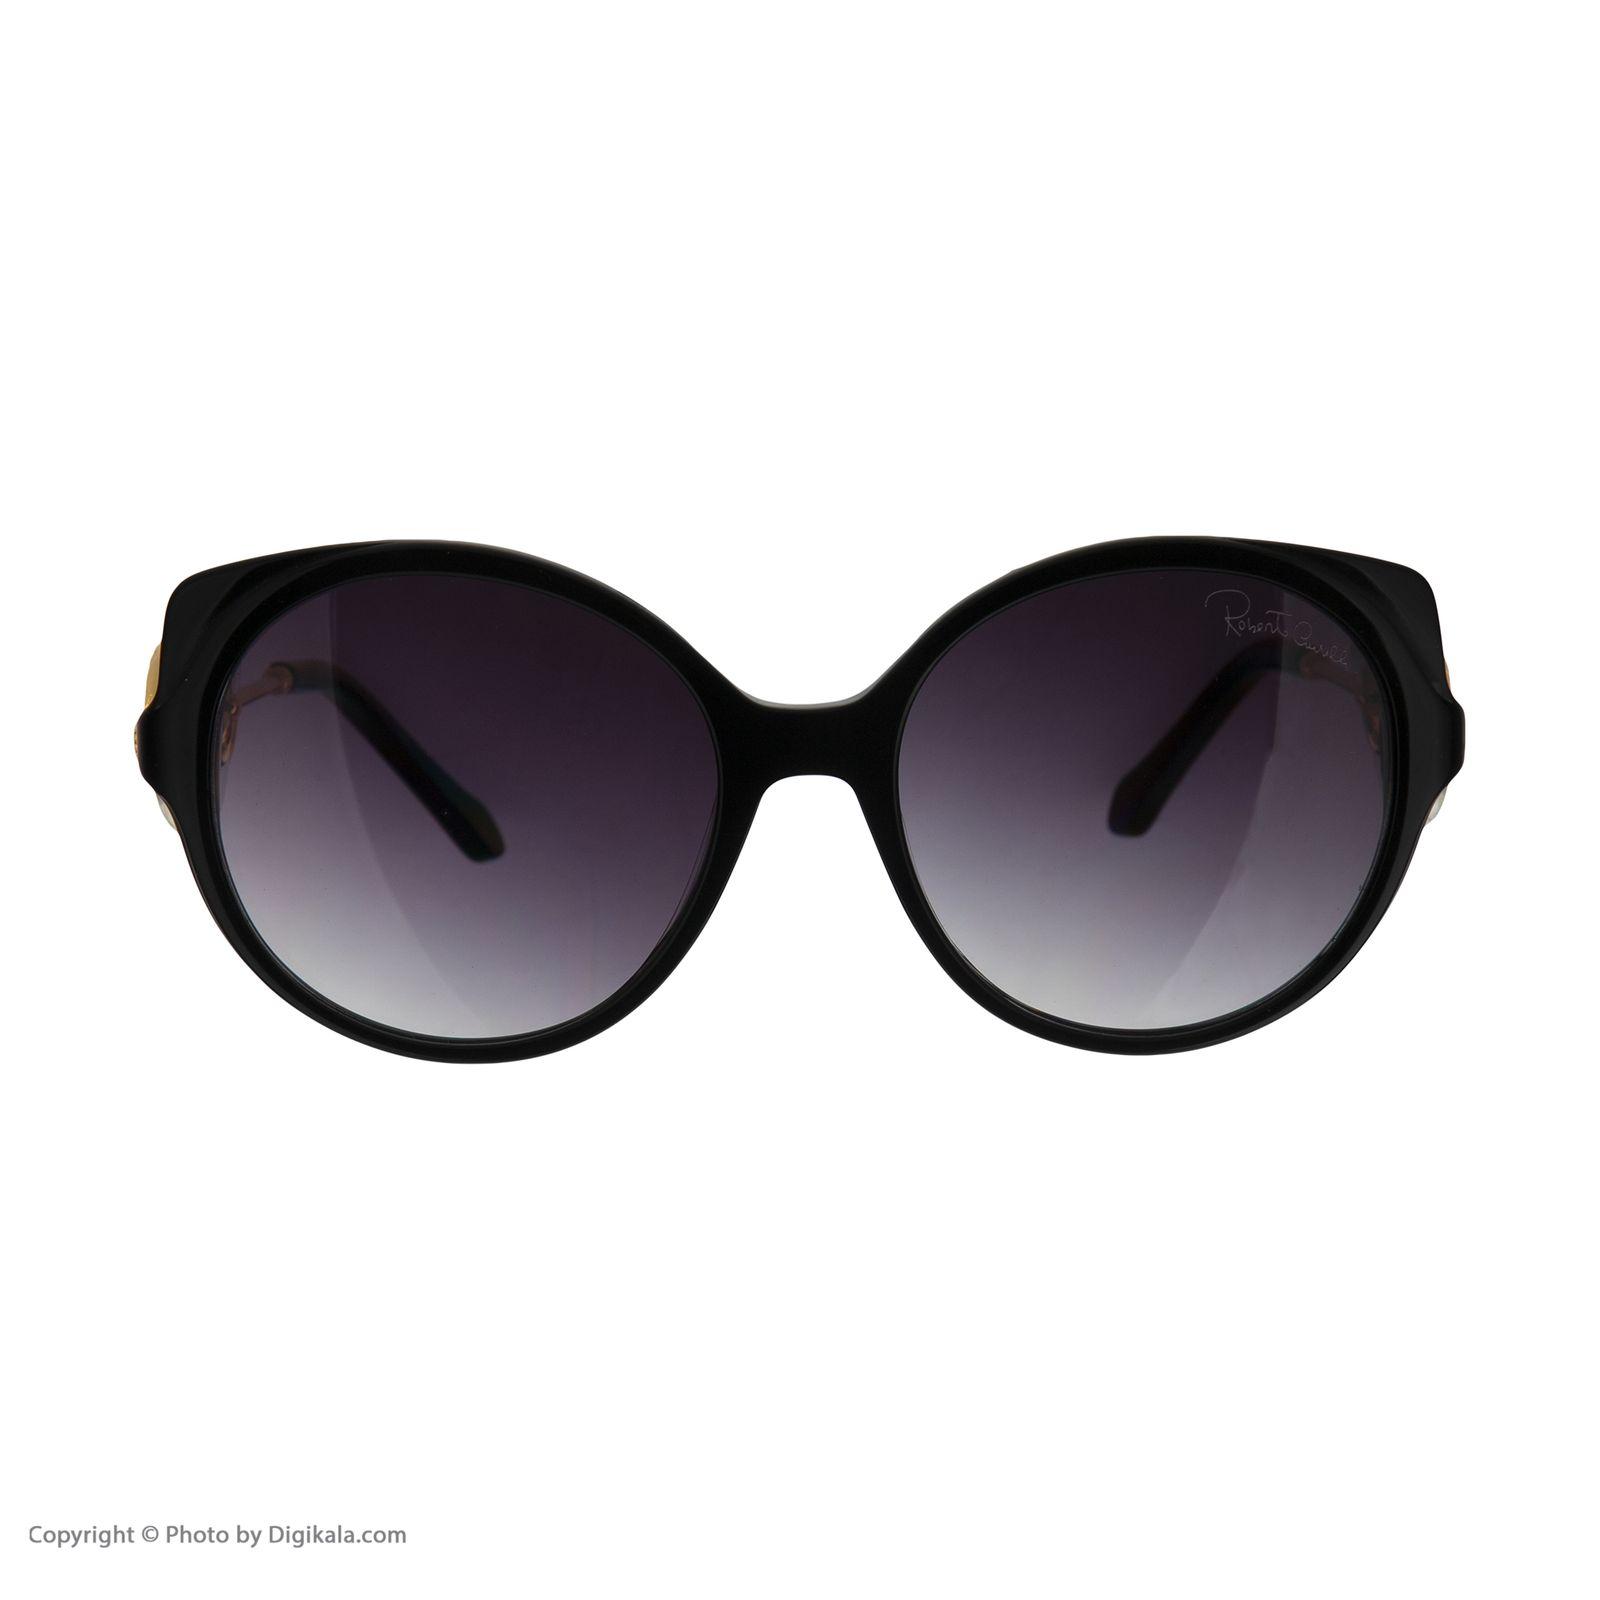 عینک آفتابی زنانه روبرتو کاوالی مدل 1035 -  - 6